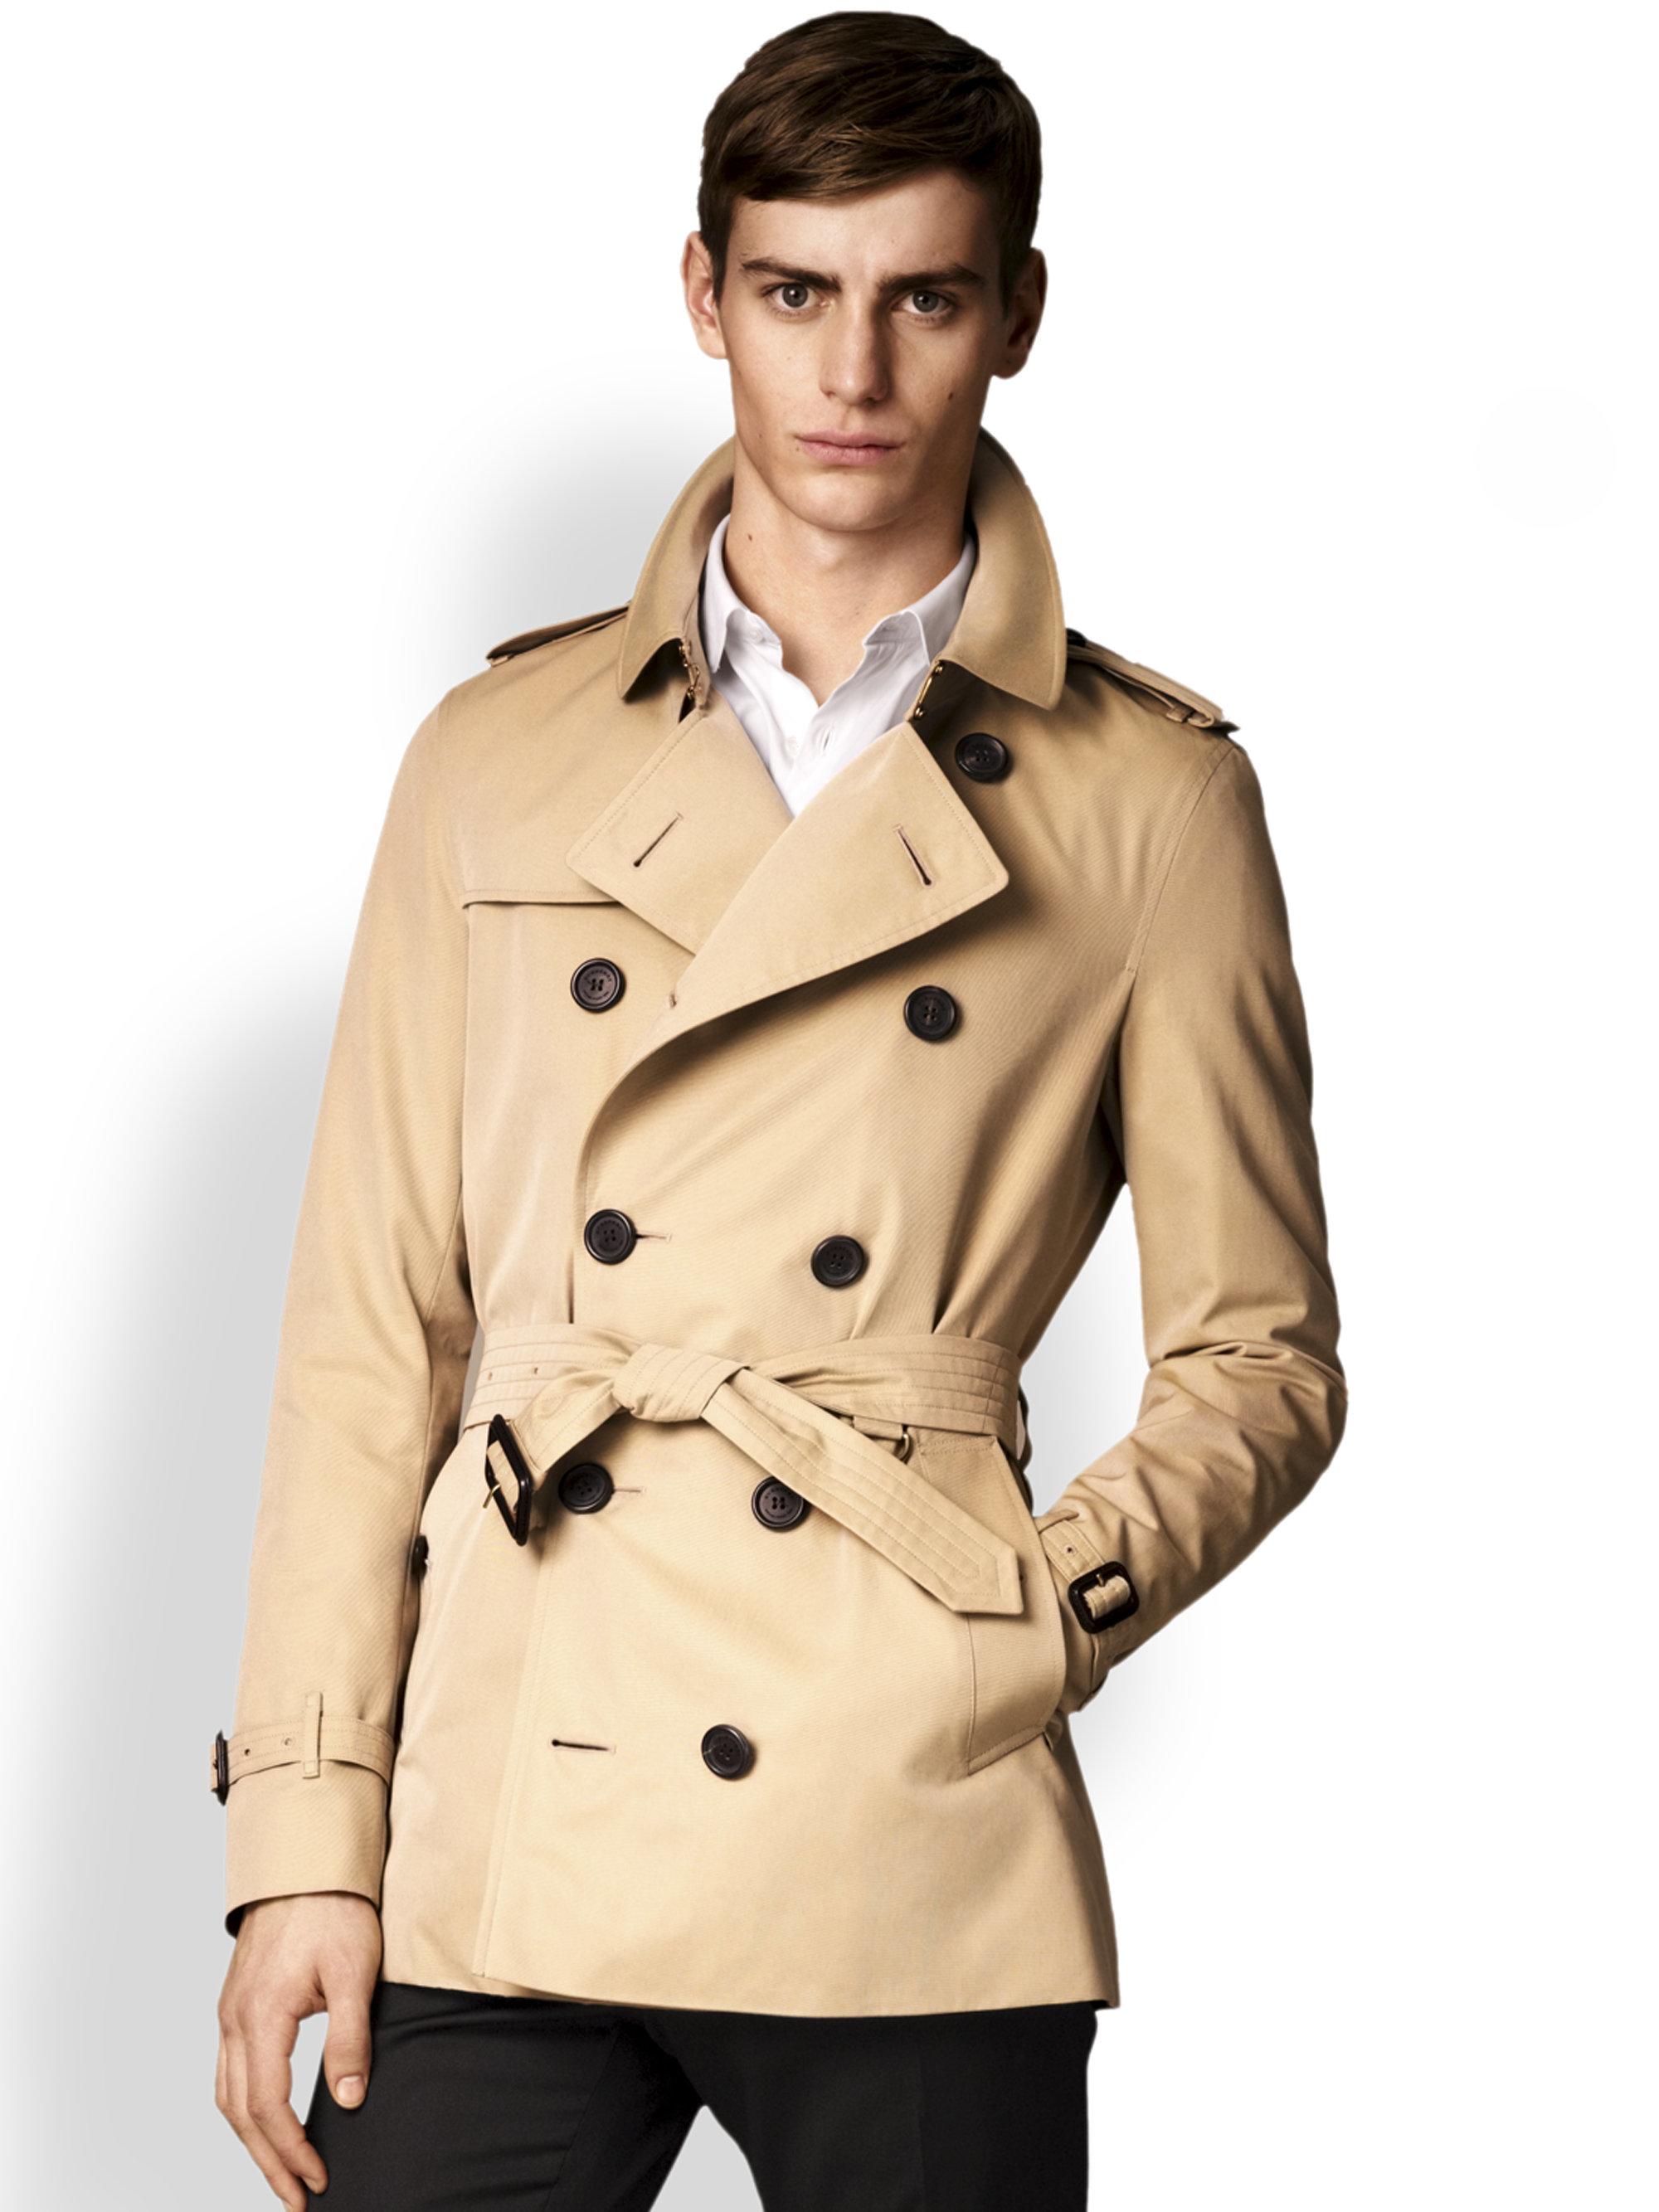 Burberry Sandringham Heritage Trench Coat in Natural for Men | Lyst